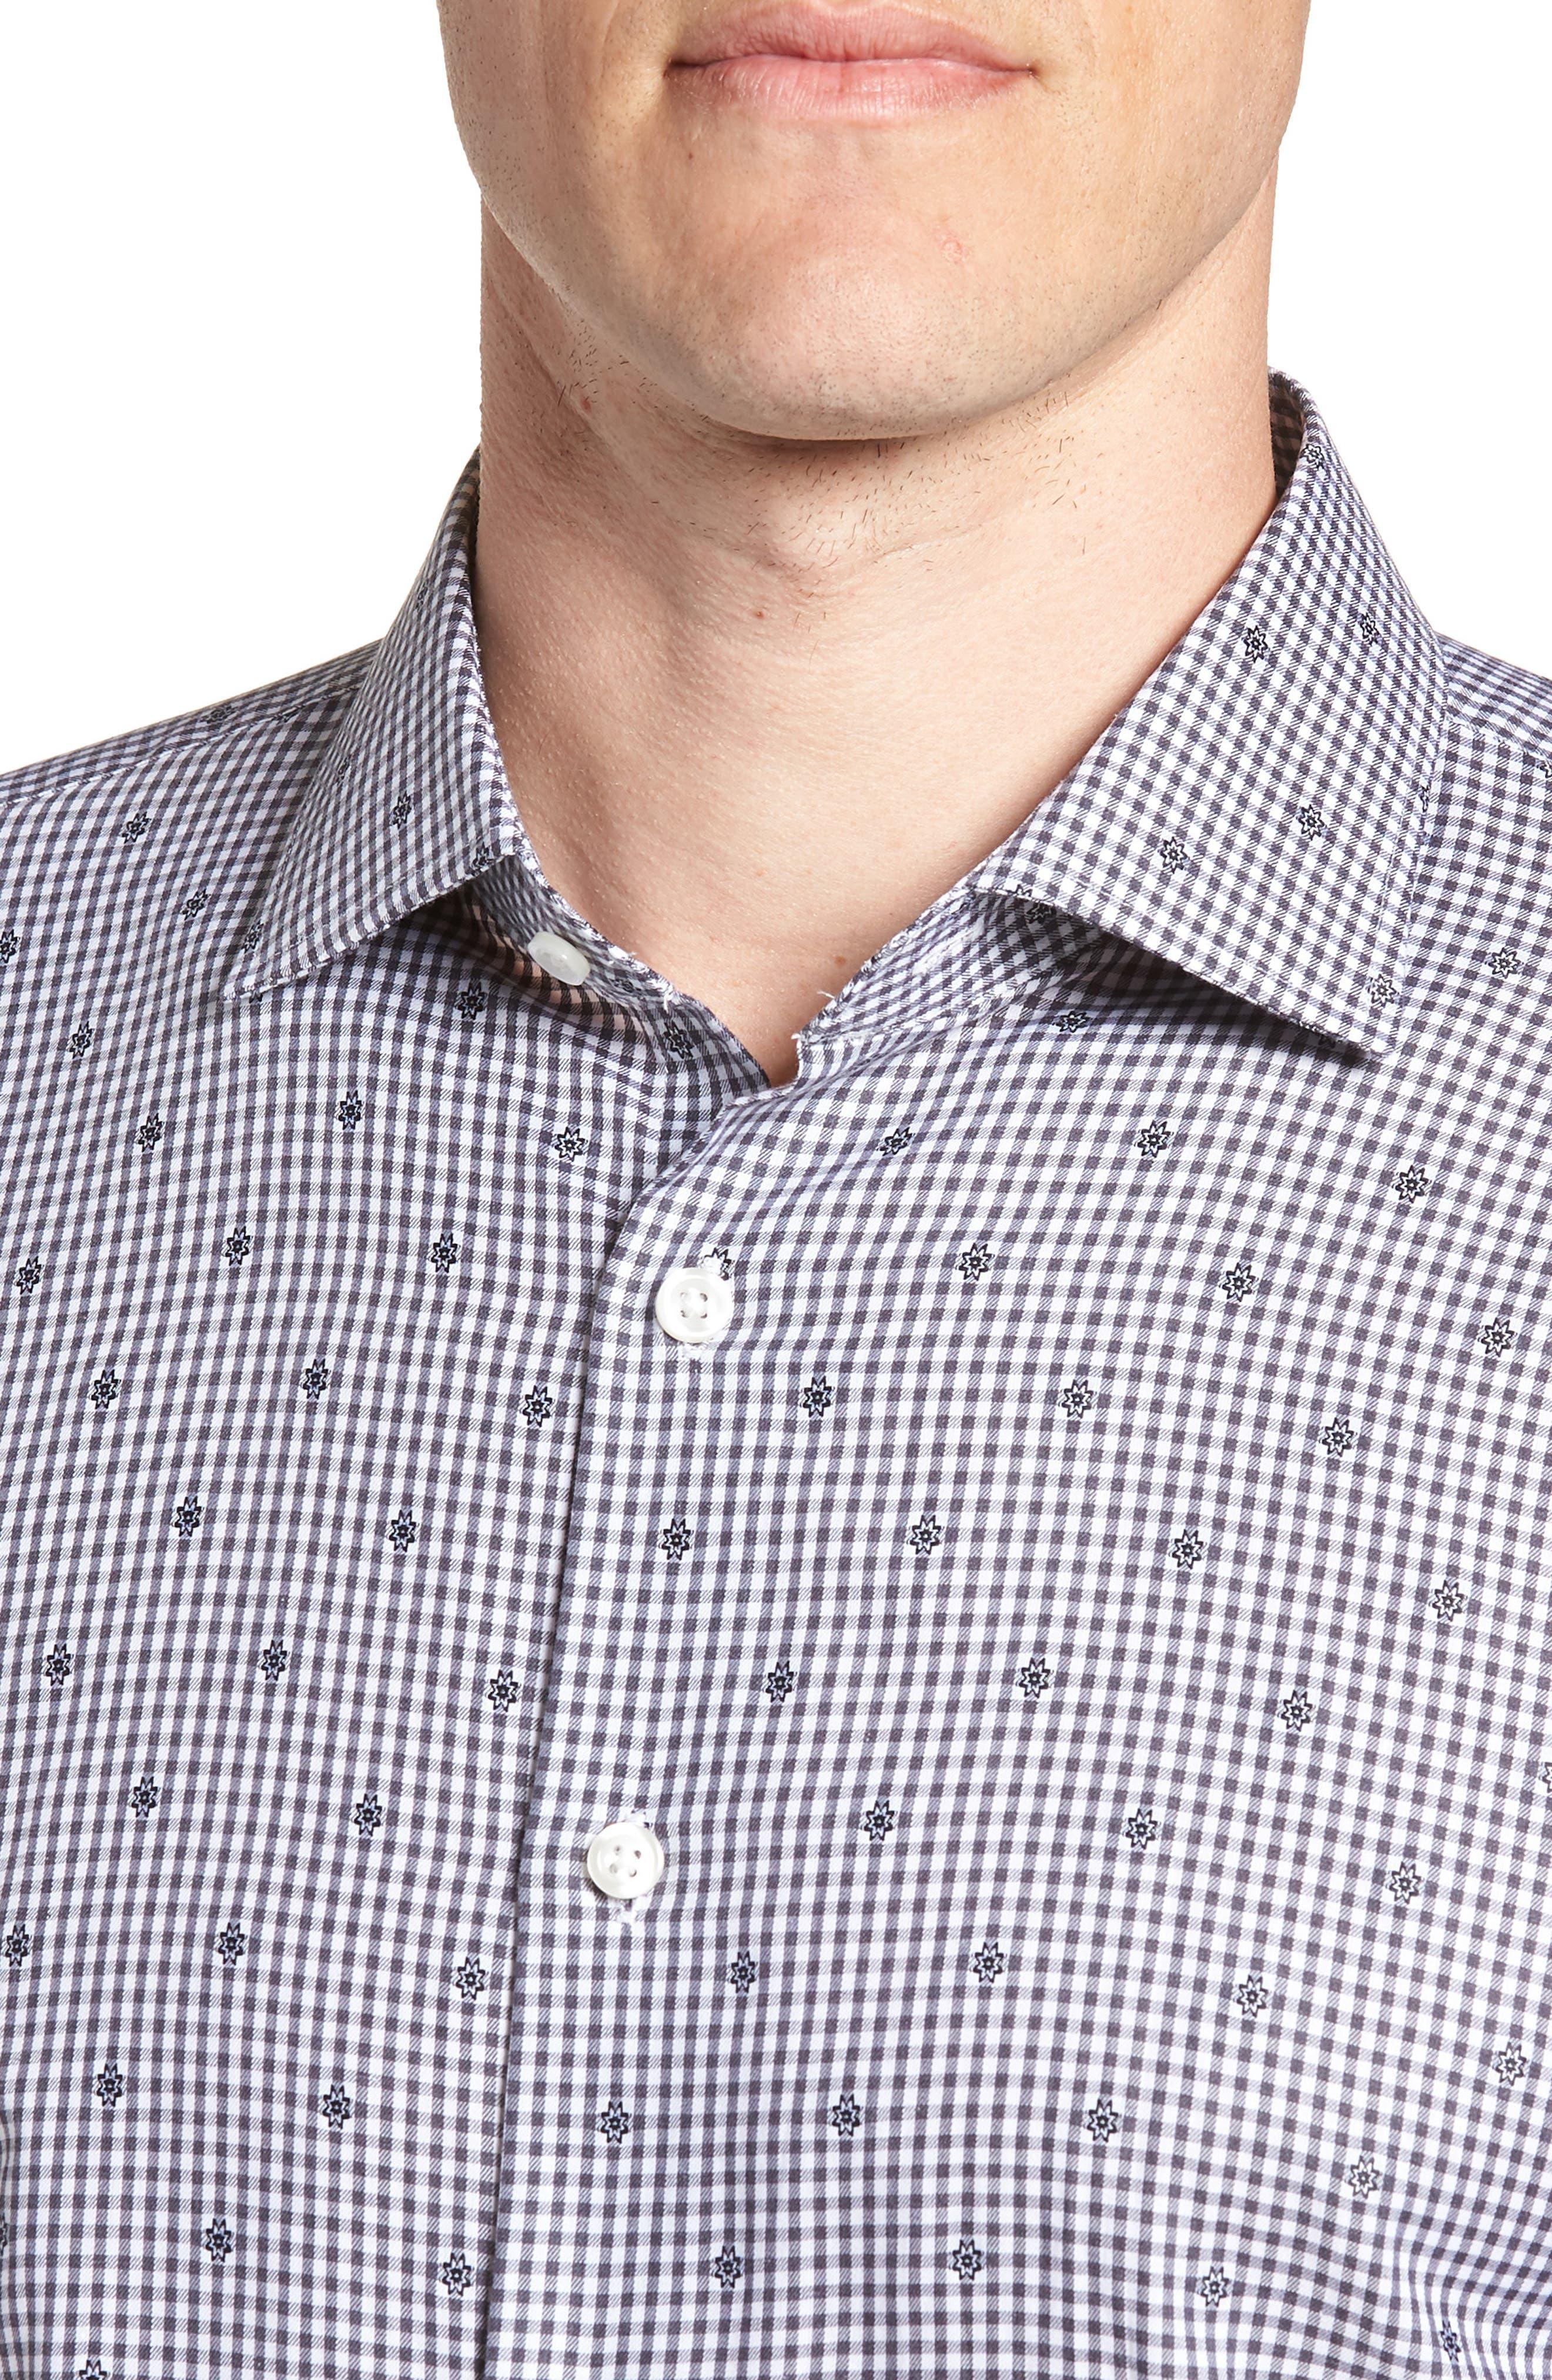 Trim Fit Check Dress Shirt,                             Alternate thumbnail 2, color,                             Grey Onyx